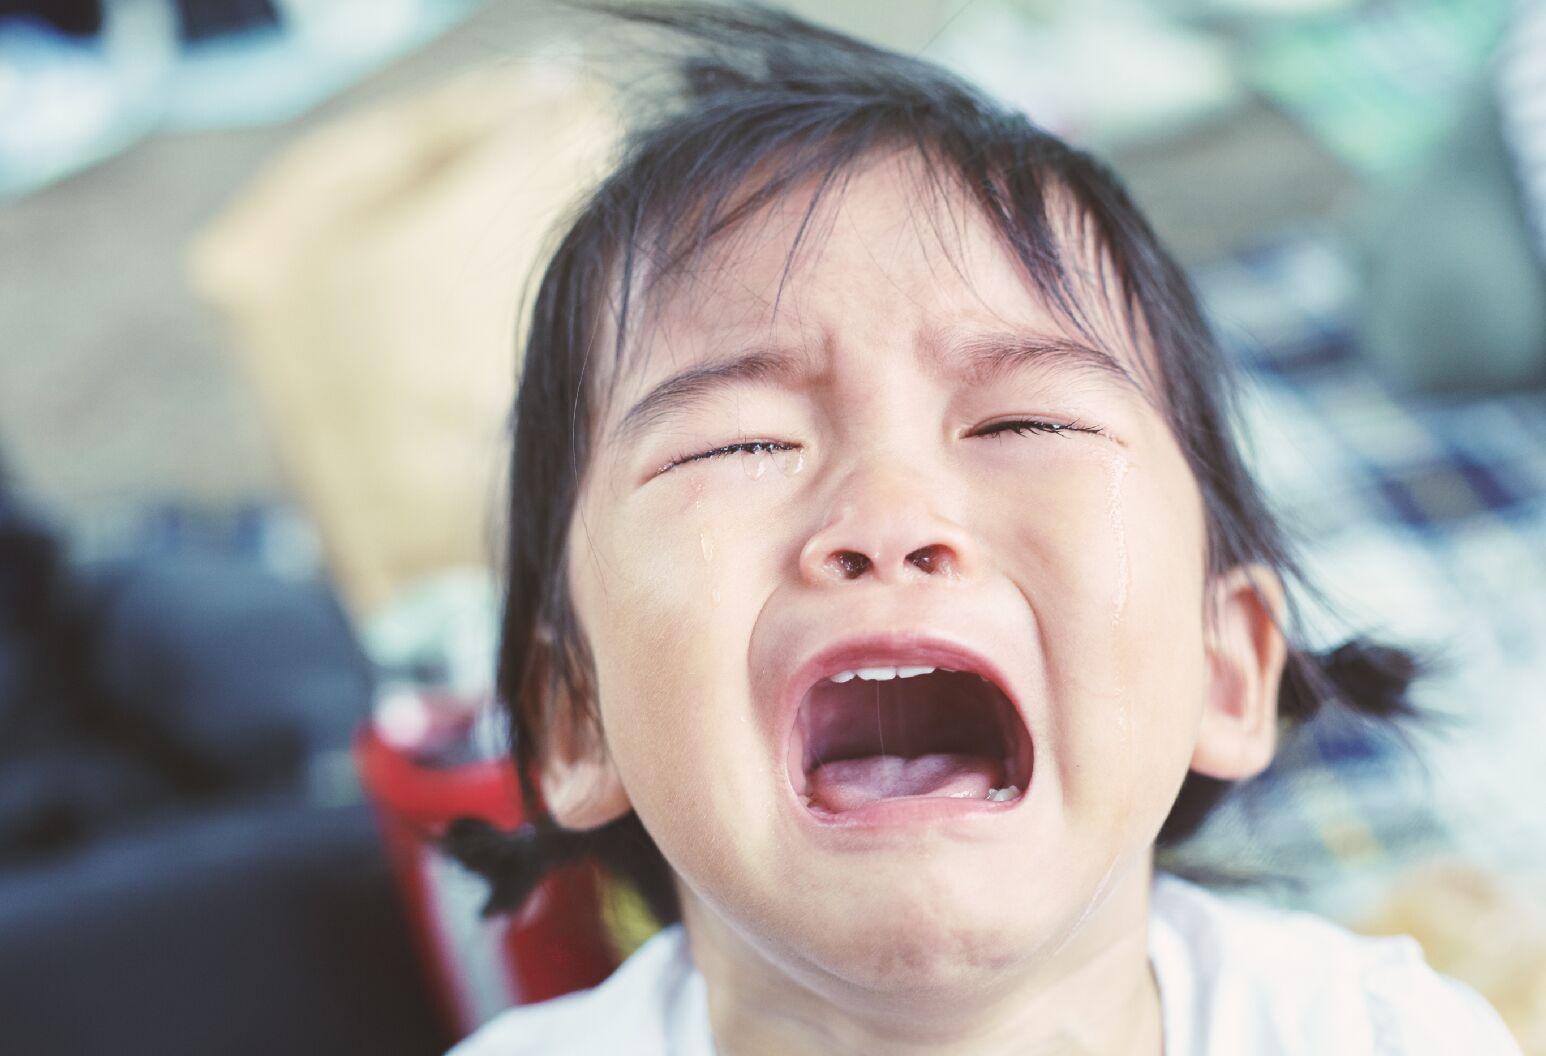 Child crying at the camera